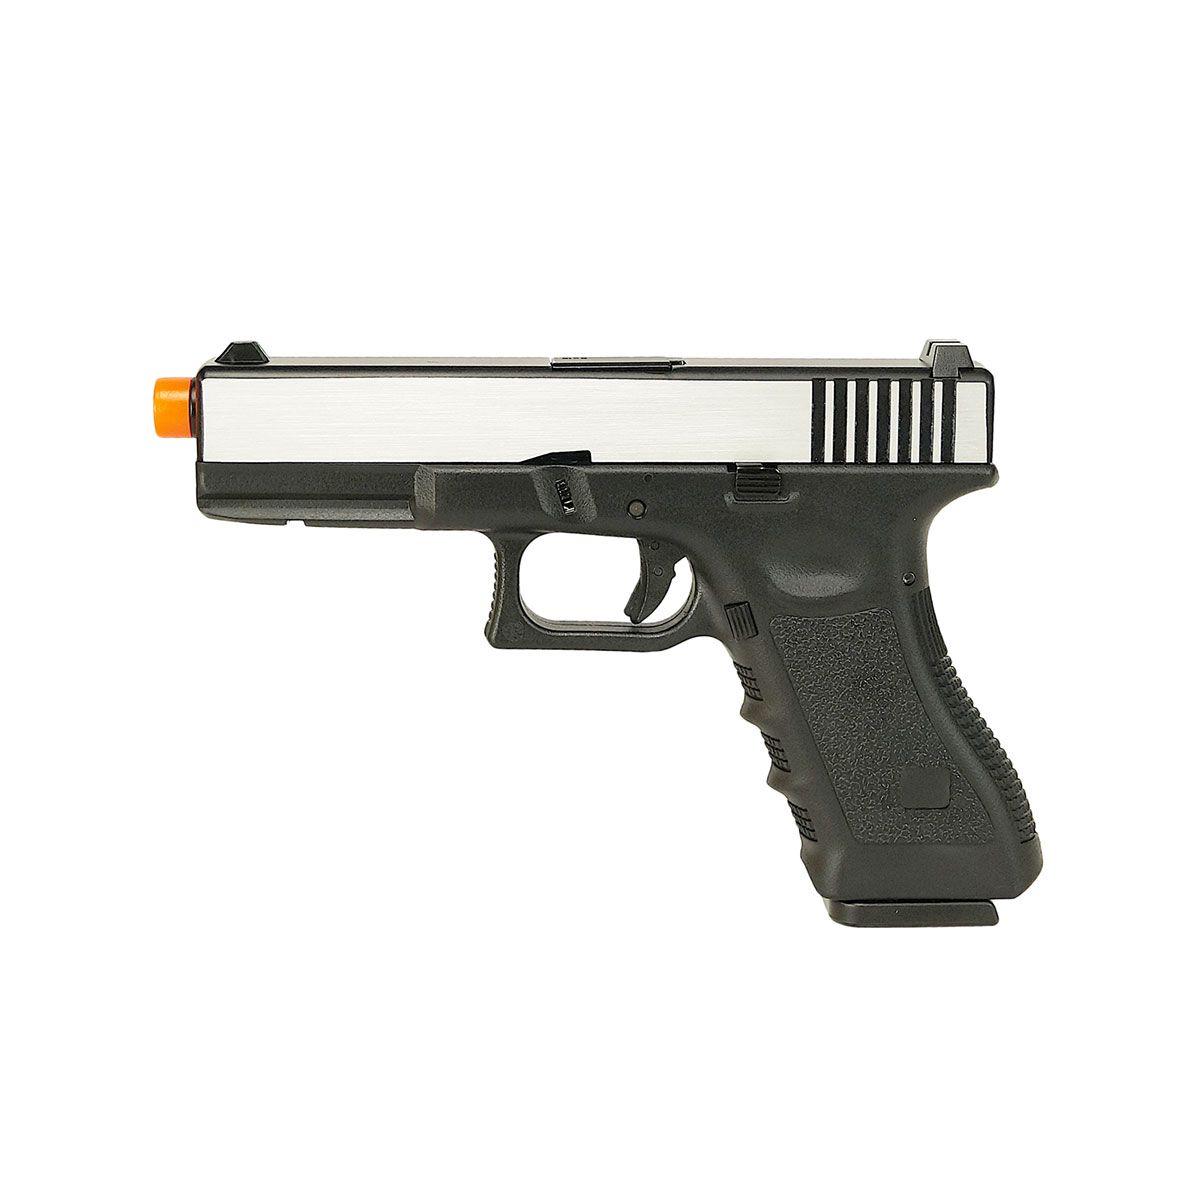 Pistola de Airsoft a Gás GBB Green Gas Glock R17 Black/Silver Blowback 6mm